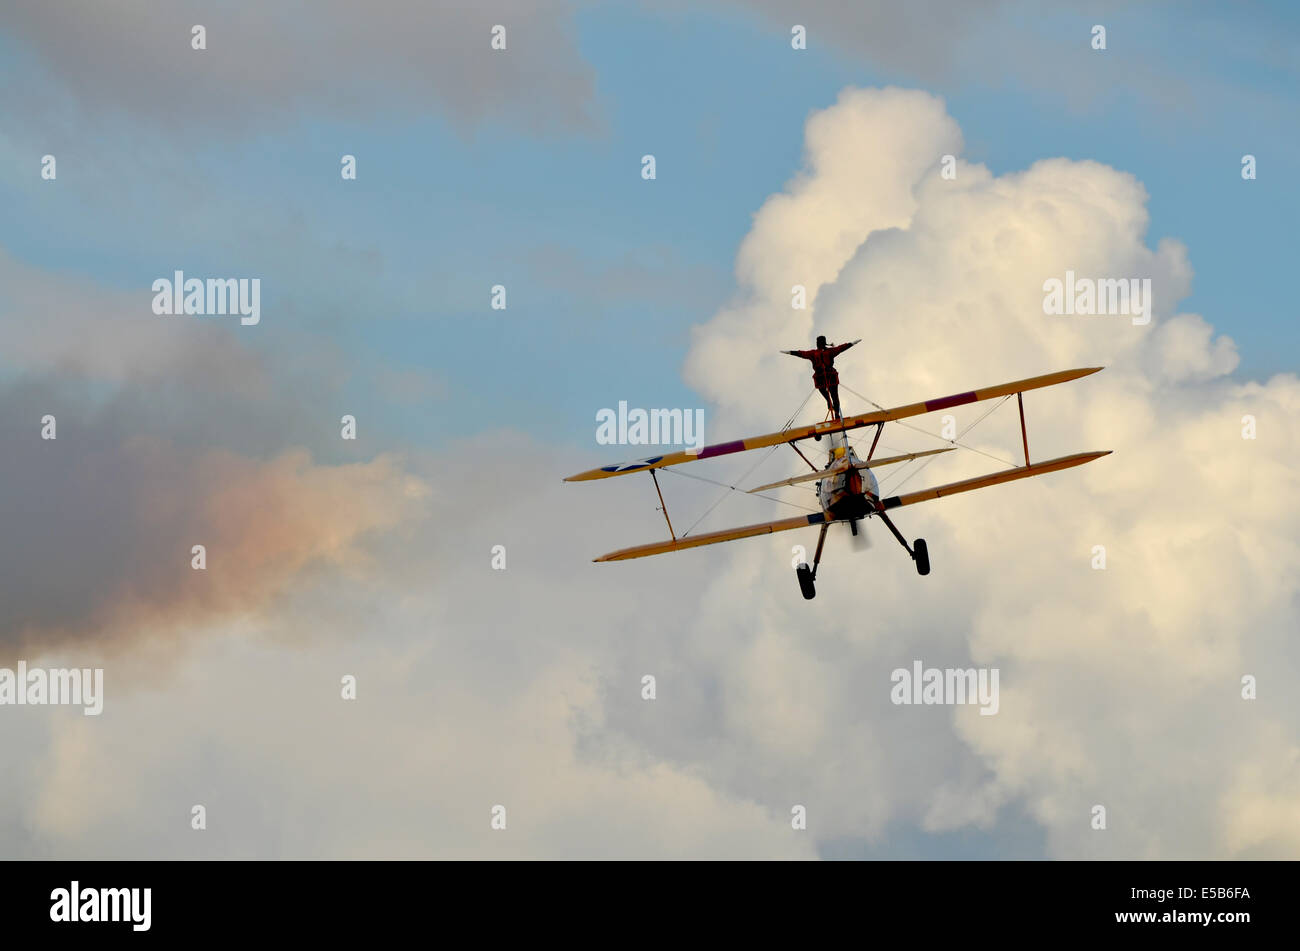 Wing walker on a yellow bi-plane flying away. - Stock Image